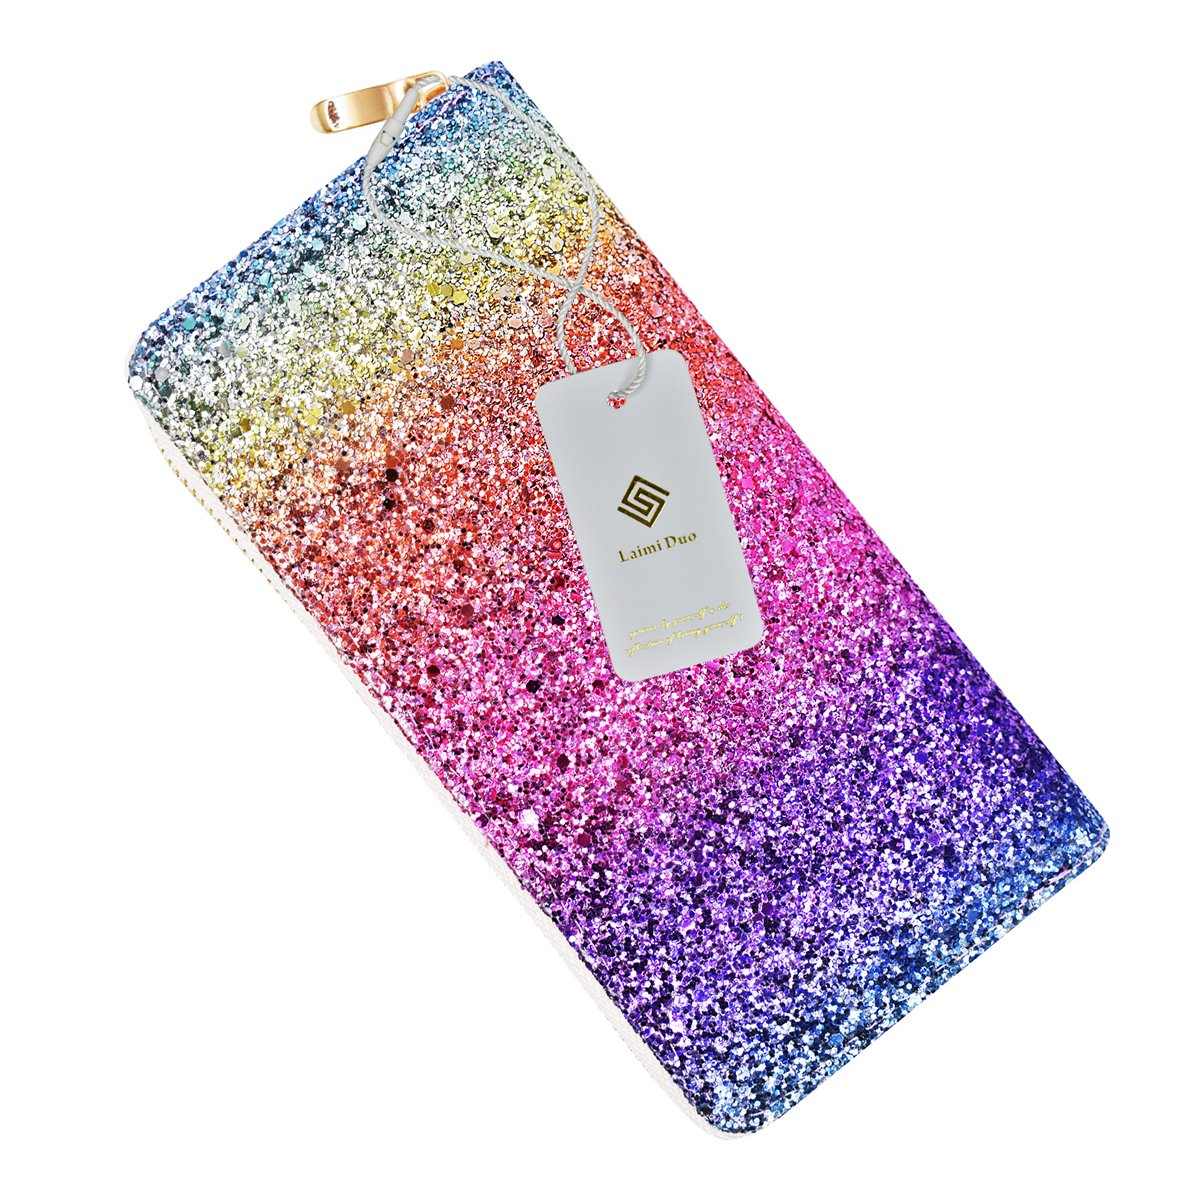 Ombre Bling Glitter Wallet Womens RFID Blocking Leather Purse Handbag Party Clutch Card Organizer for Women Purse (RAINBOW)